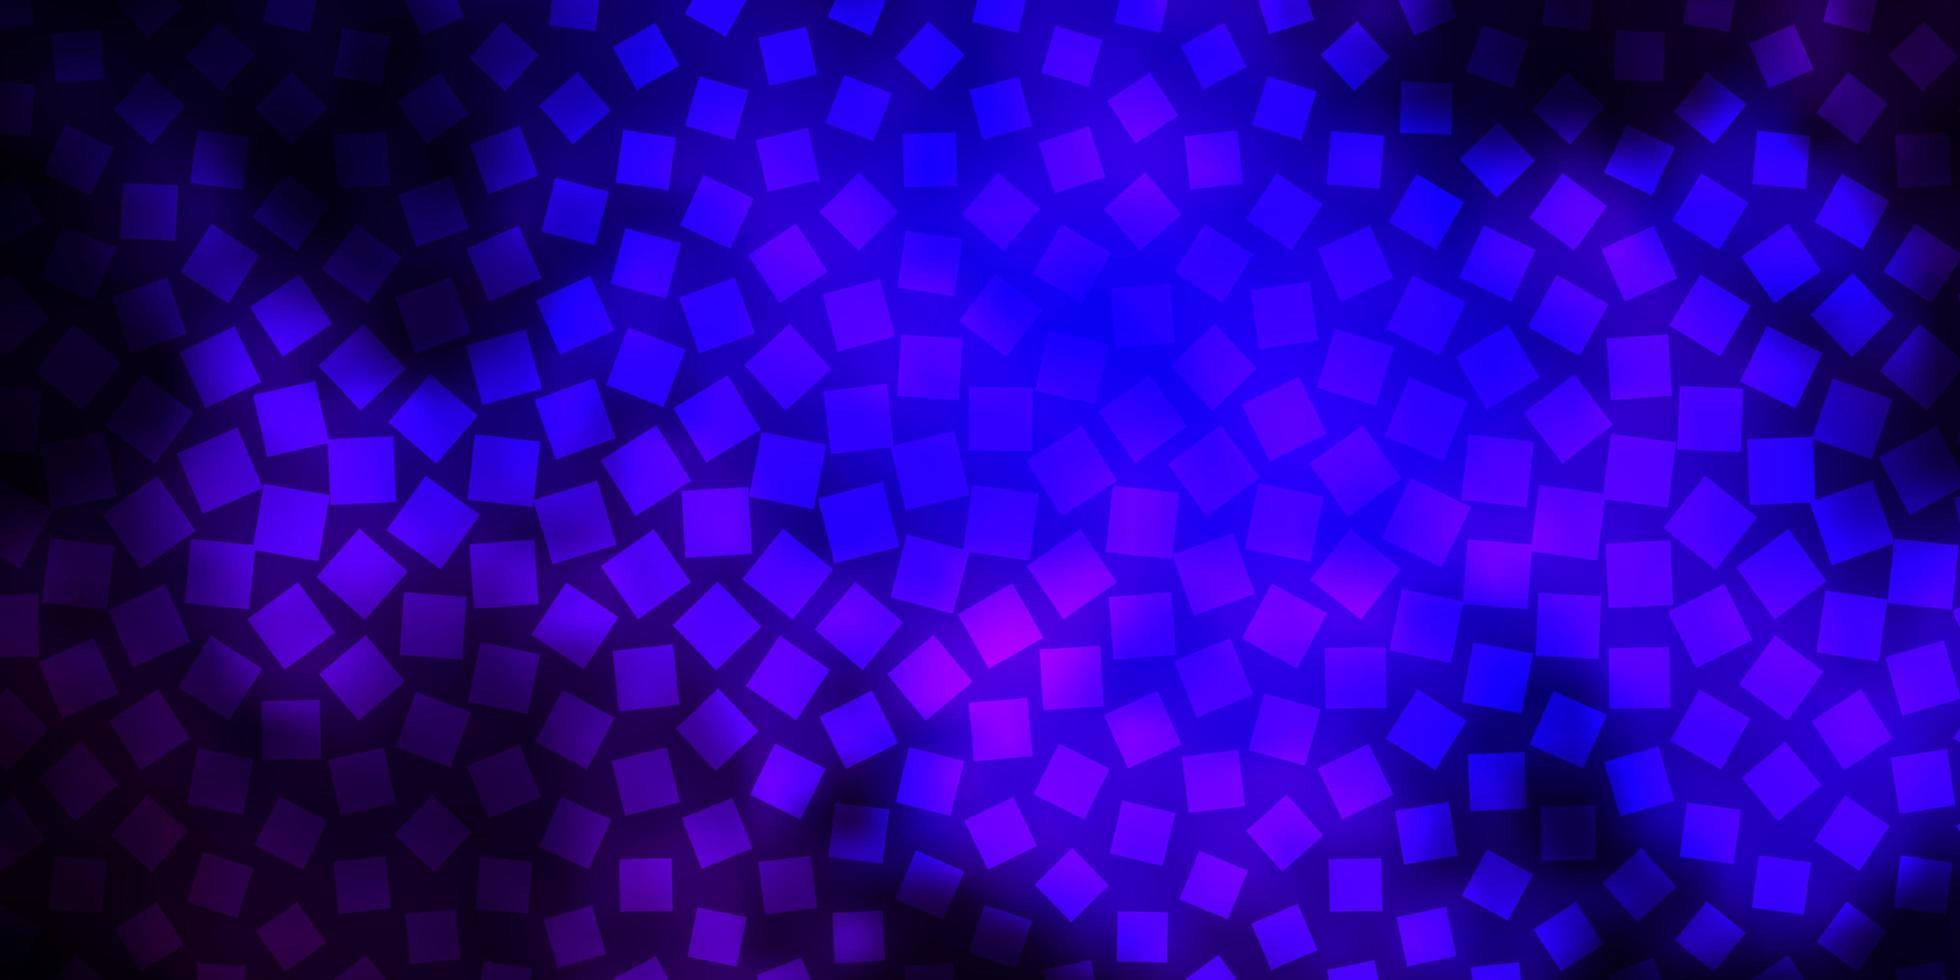 mörkrosa, blå vektorbakgrund med rektanglar. vektor